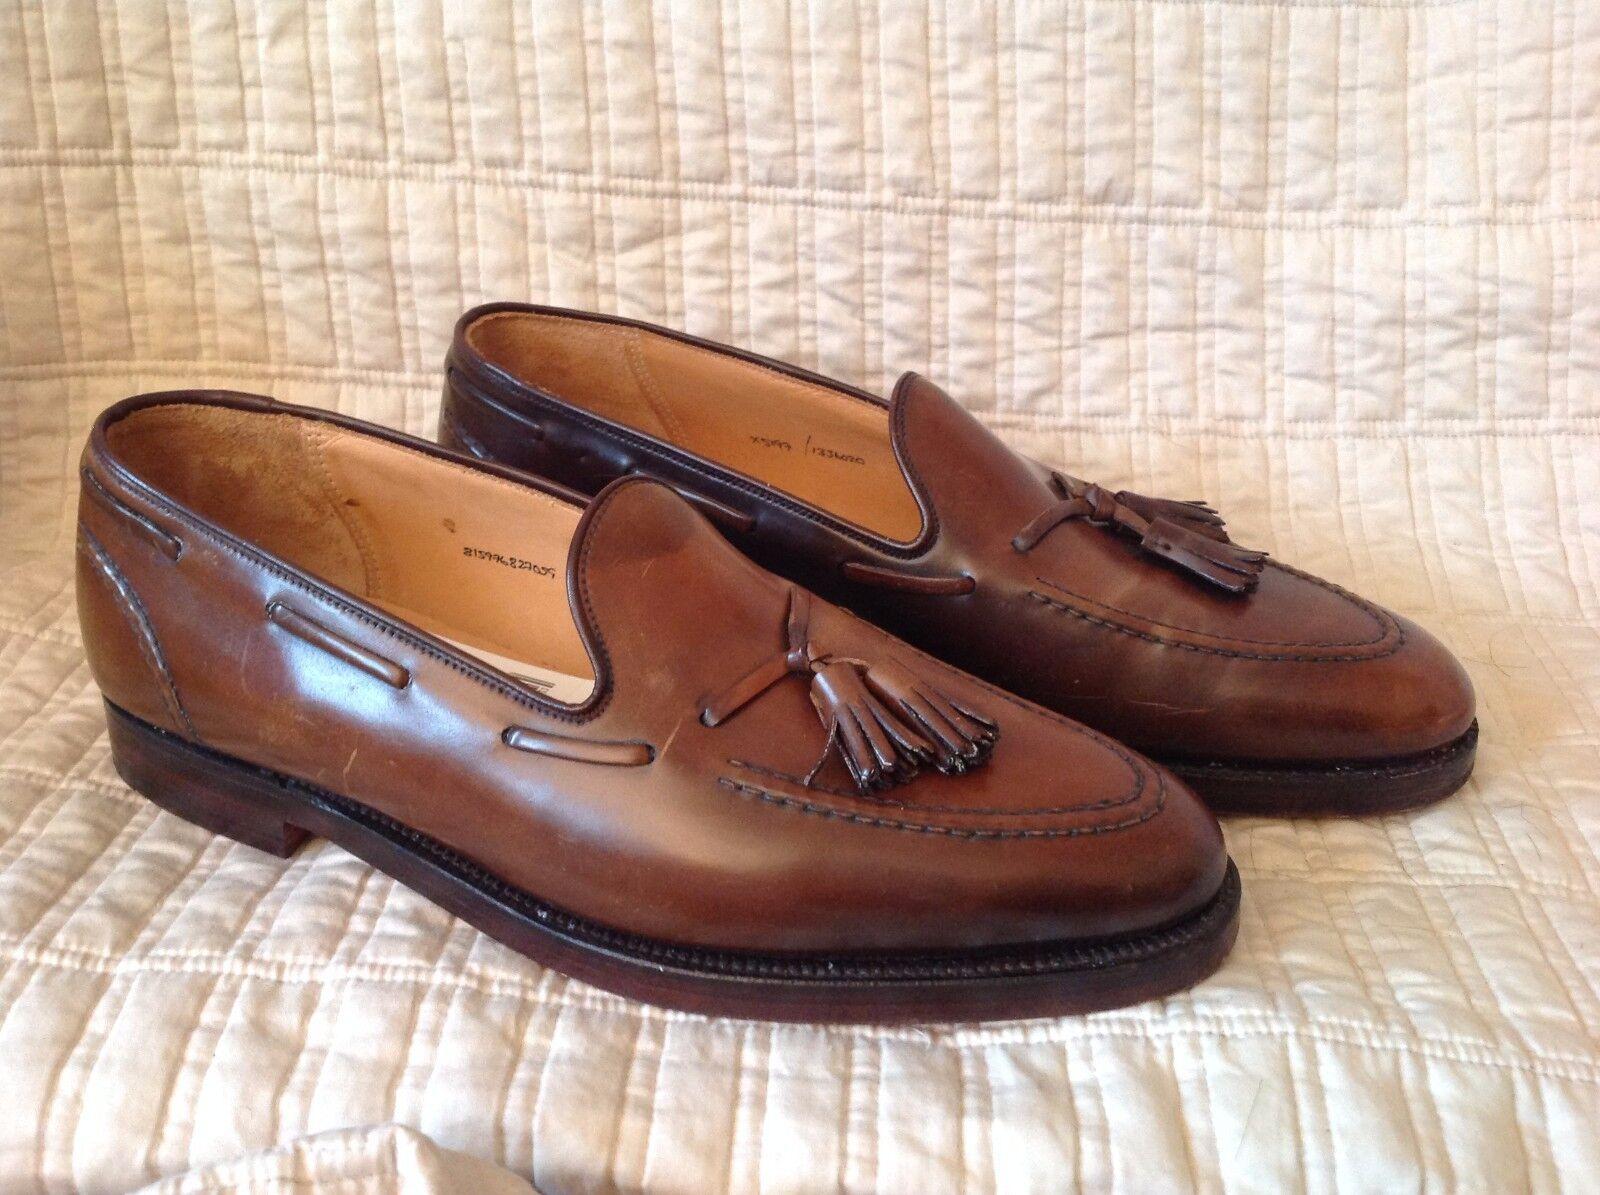 NEW Ralph Lauren Marlow Tassled shoes + 2 Dust Covers 10 D + 11.5 D